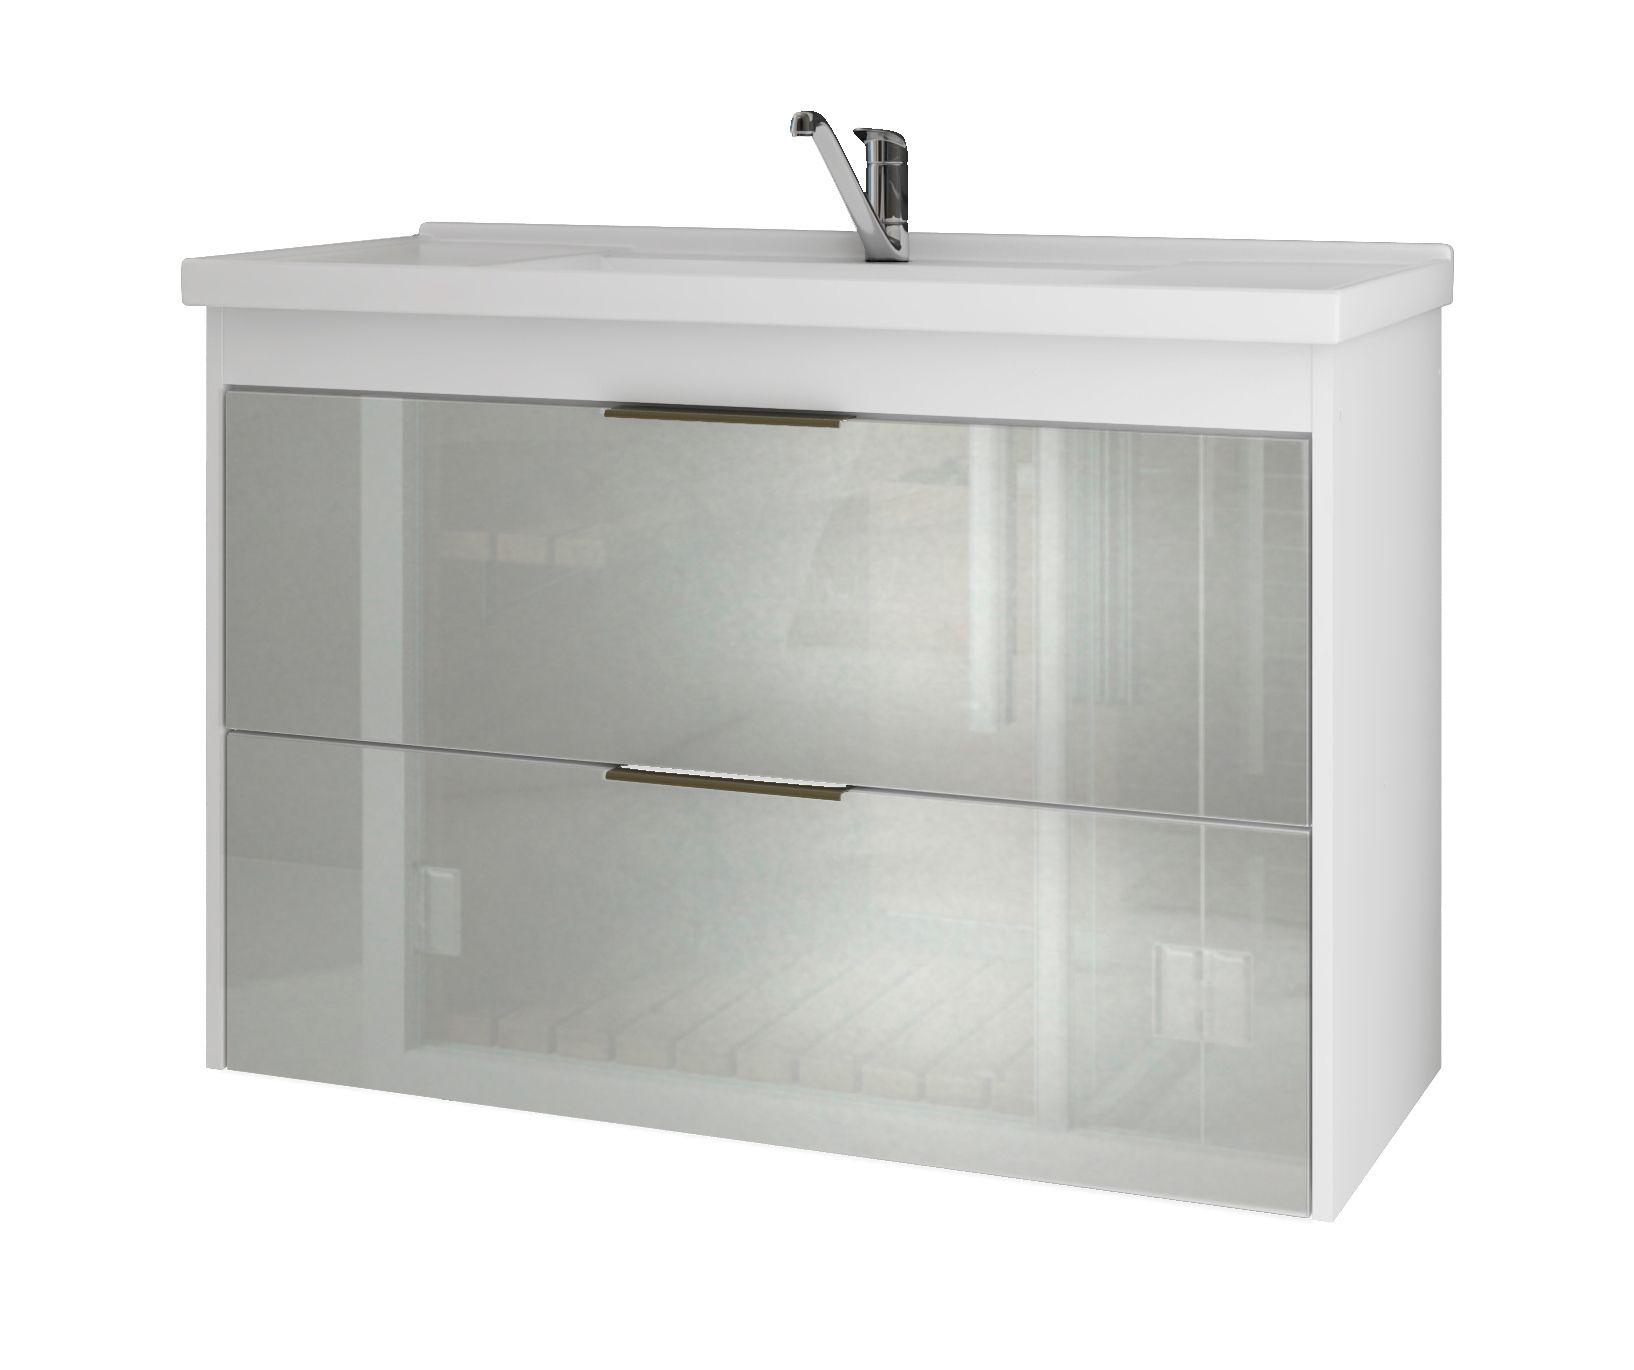 Gabinete Para Banheiro Lavanda 79 Cm Frente Vidro MGM Móveis Branco